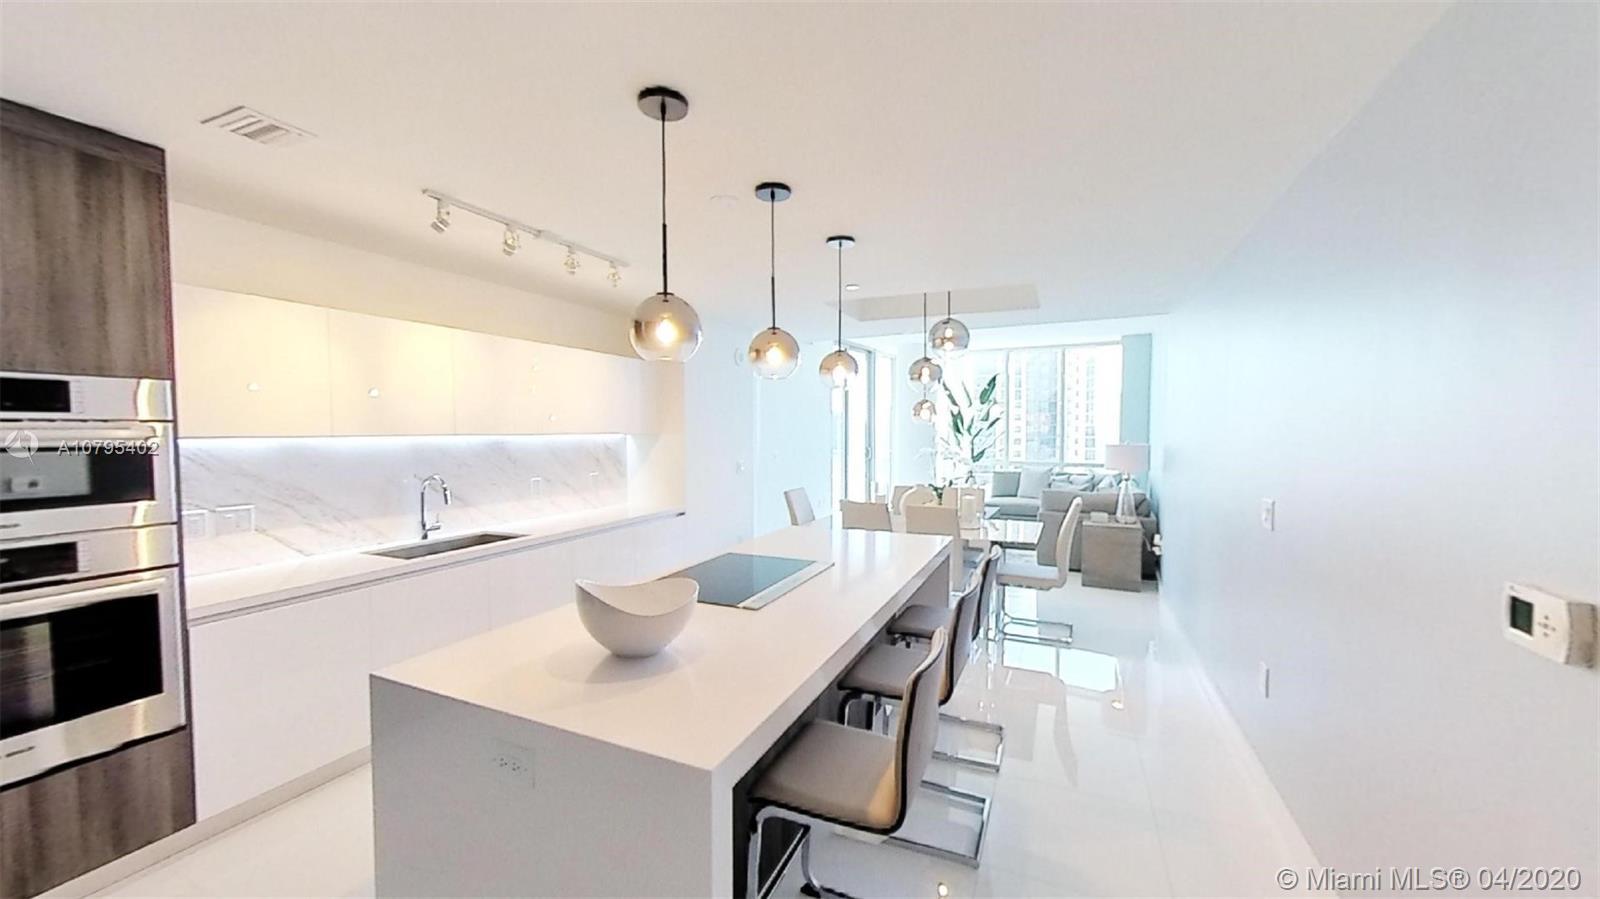 Aménagement appartement Miami